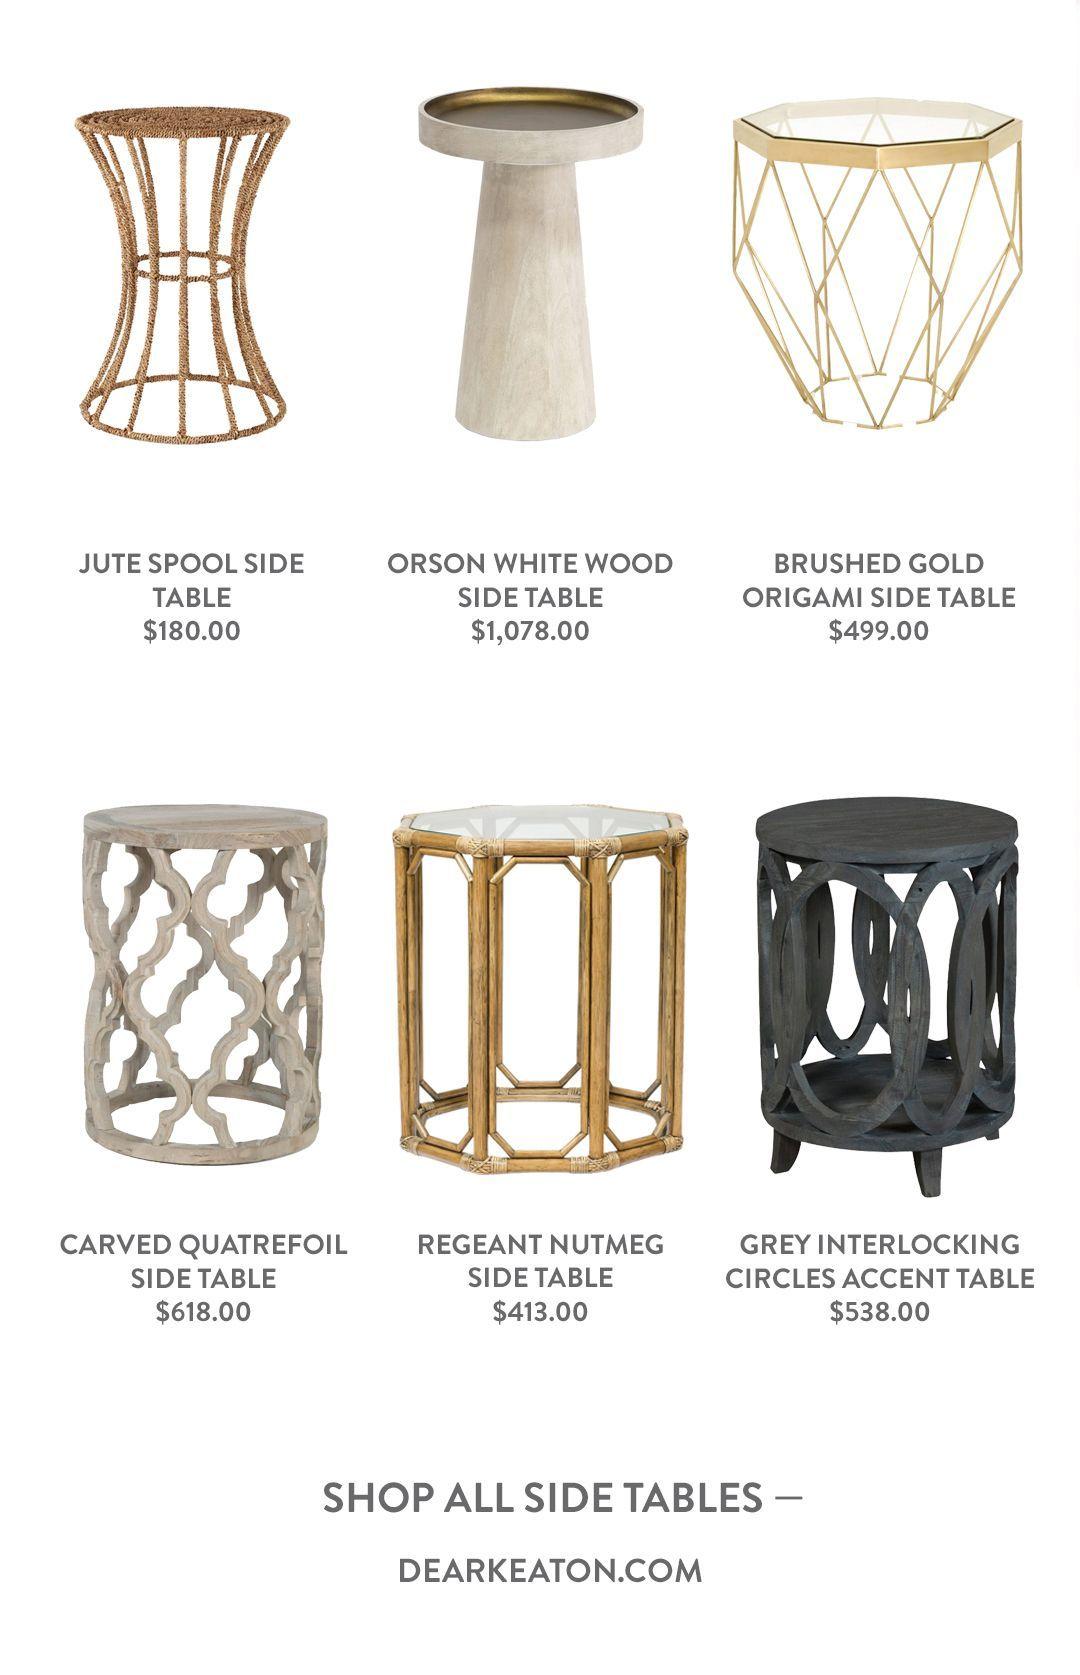 Spotlight On Side Tables Decorating Dear Keaton Blog Side Table Boho Chic Interior Design Trending Decor